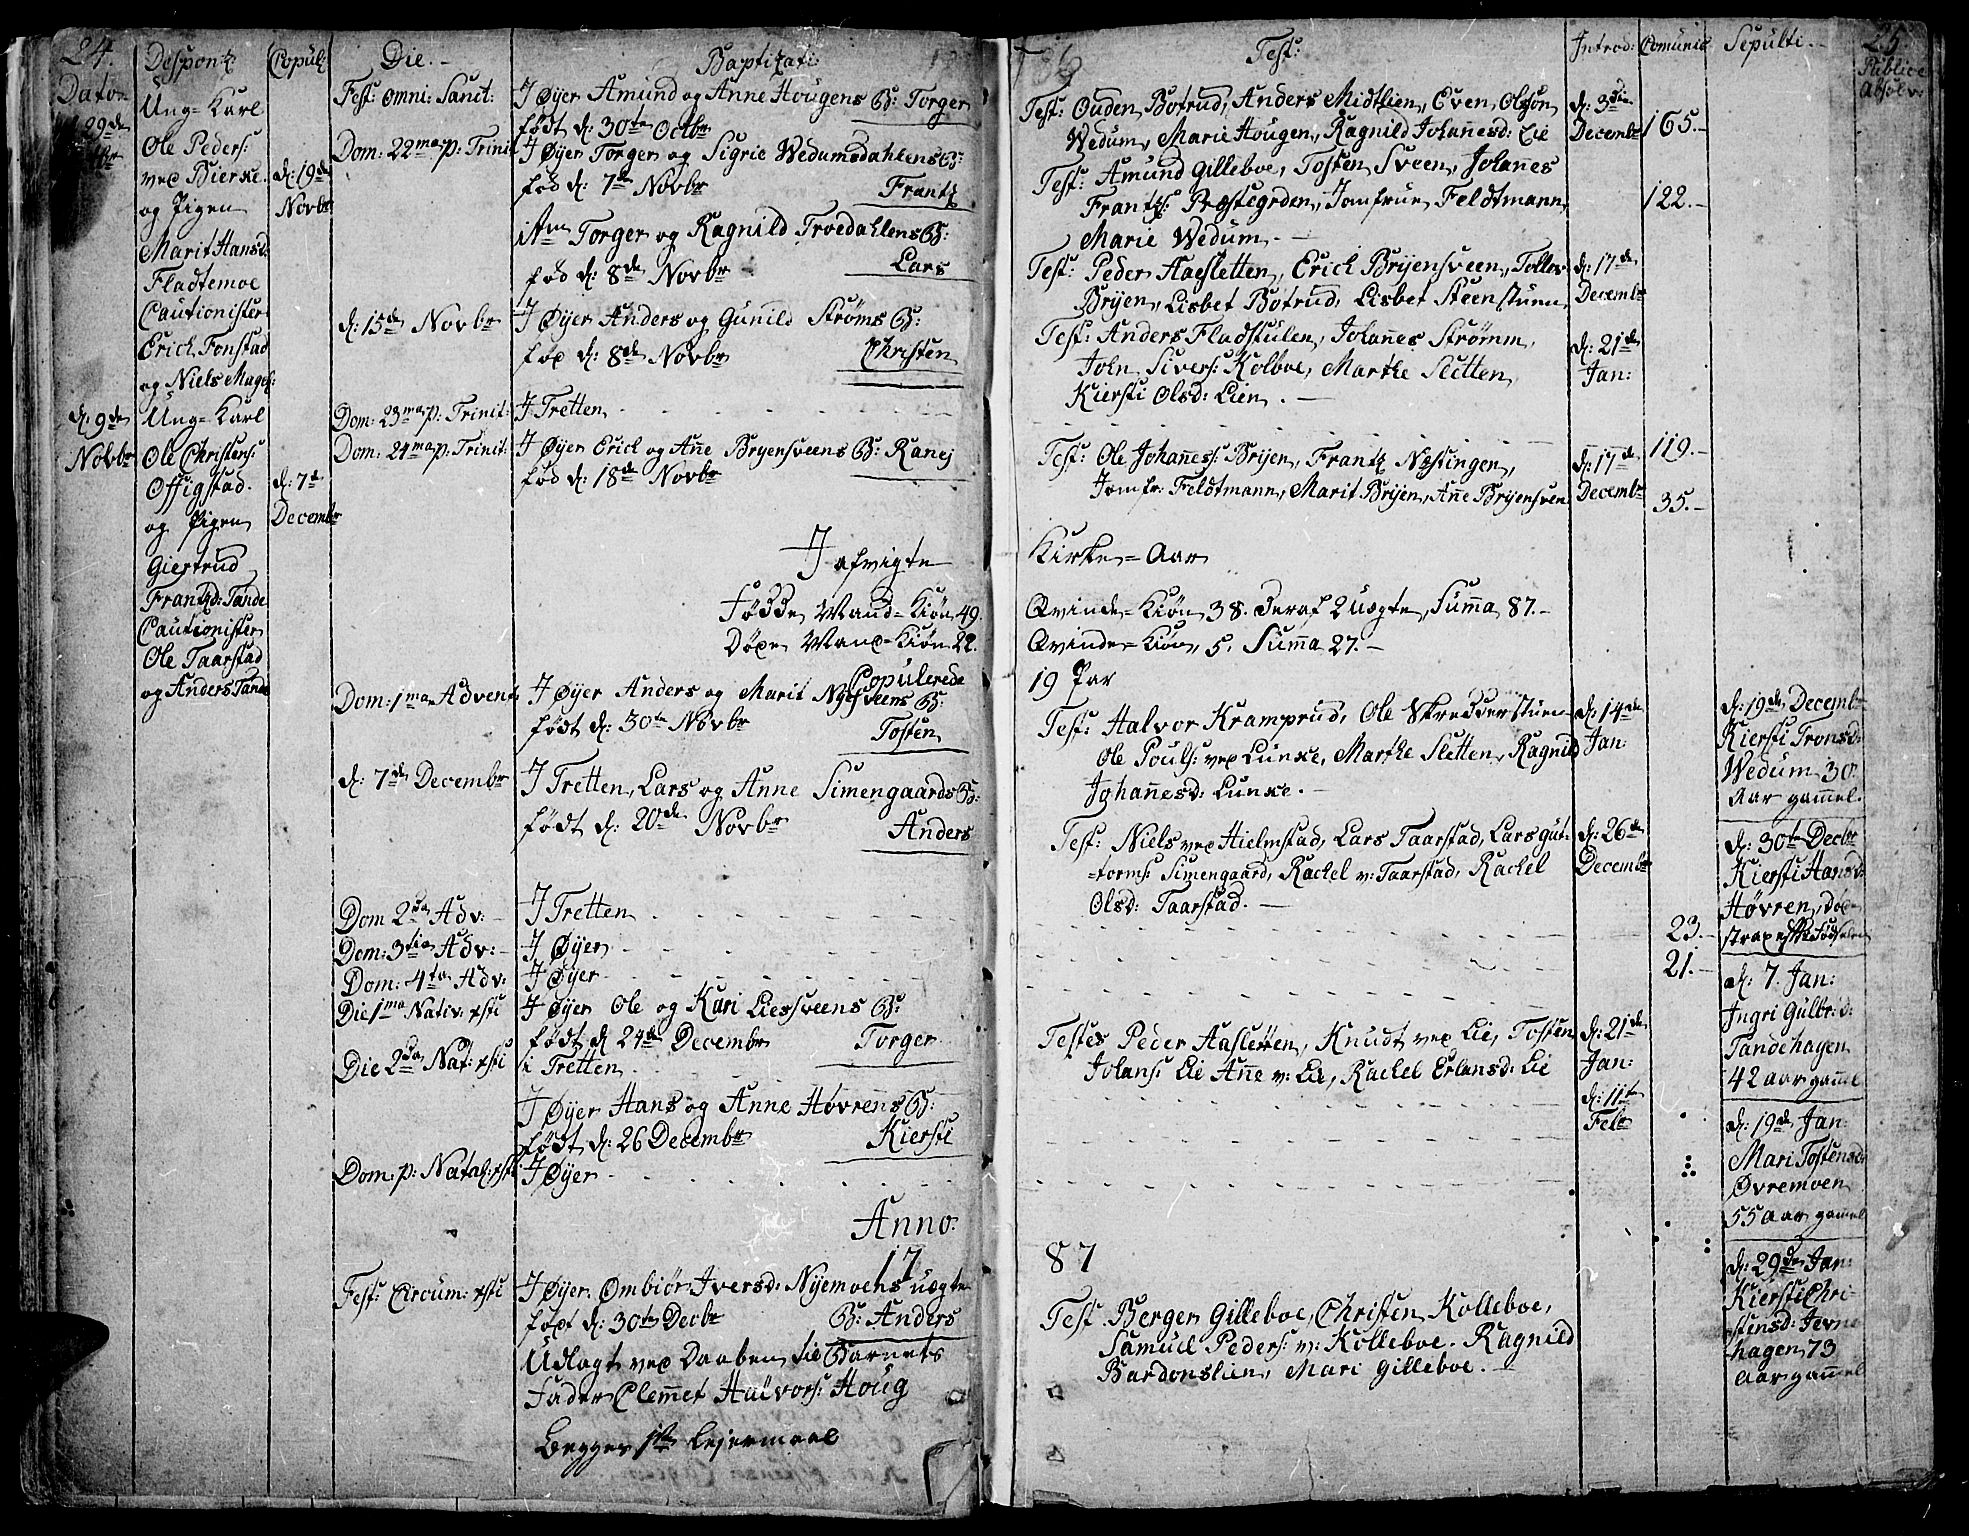 SAH, Øyer prestekontor, Ministerialbok nr. 3, 1784-1824, s. 24-25